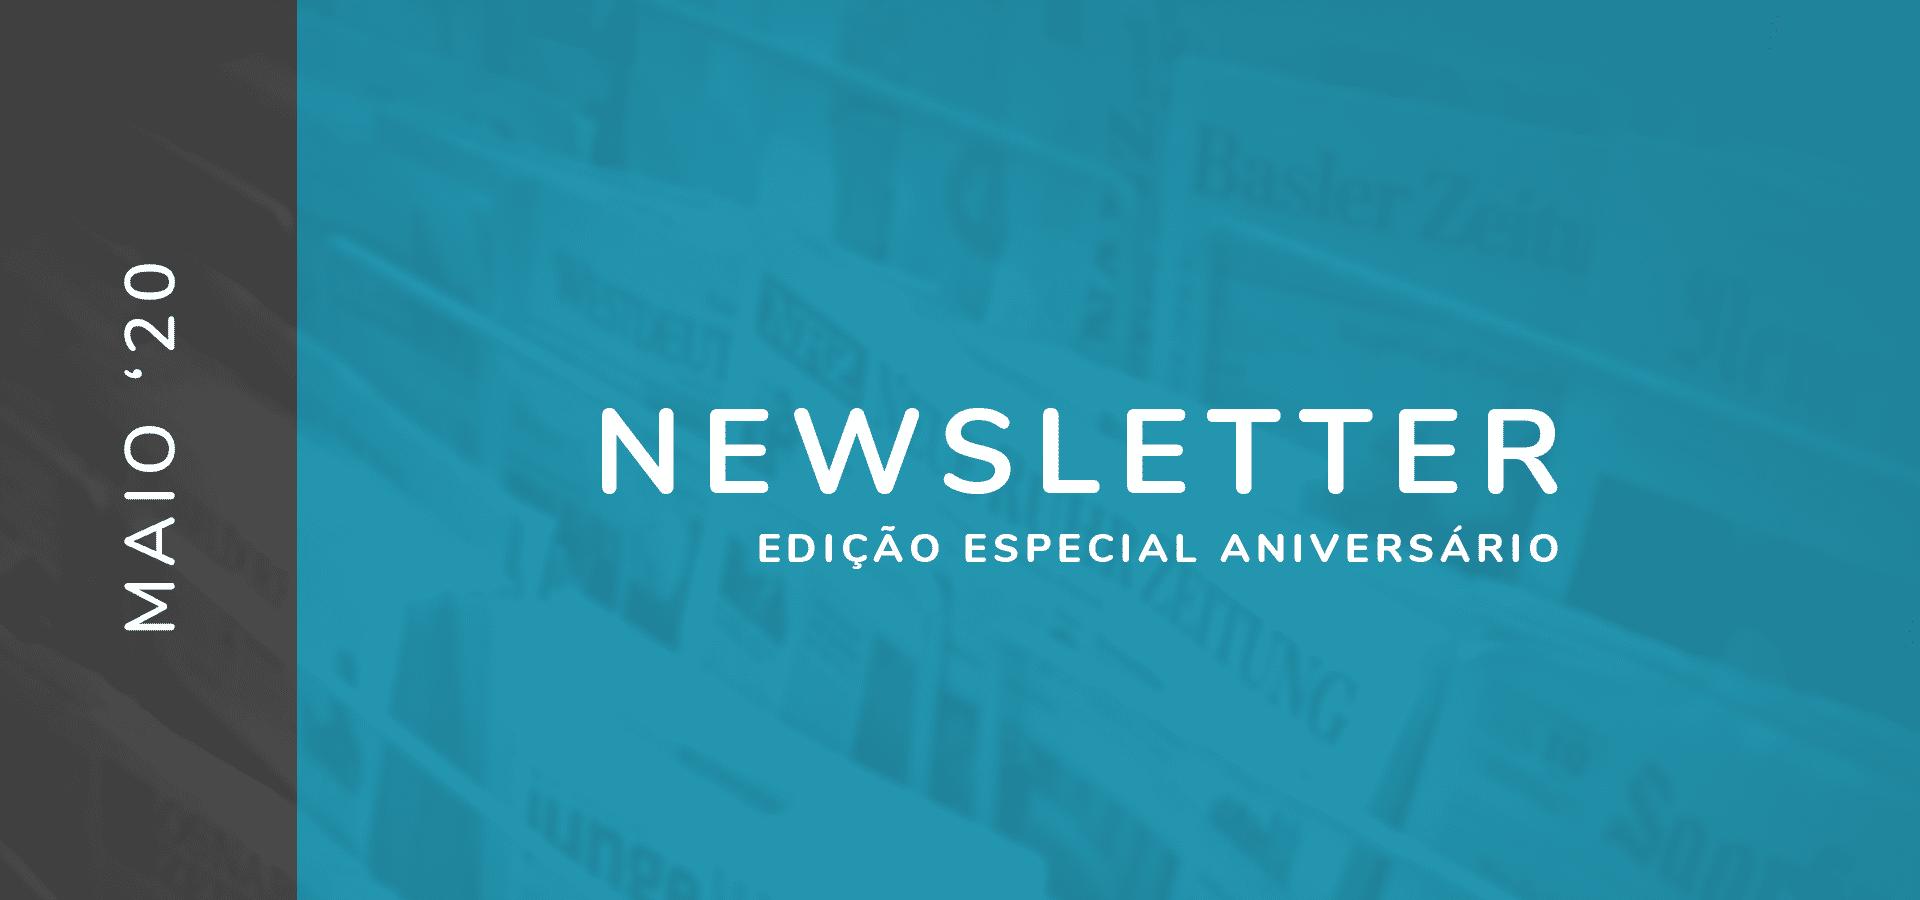 Newsletter Especial Aniversário